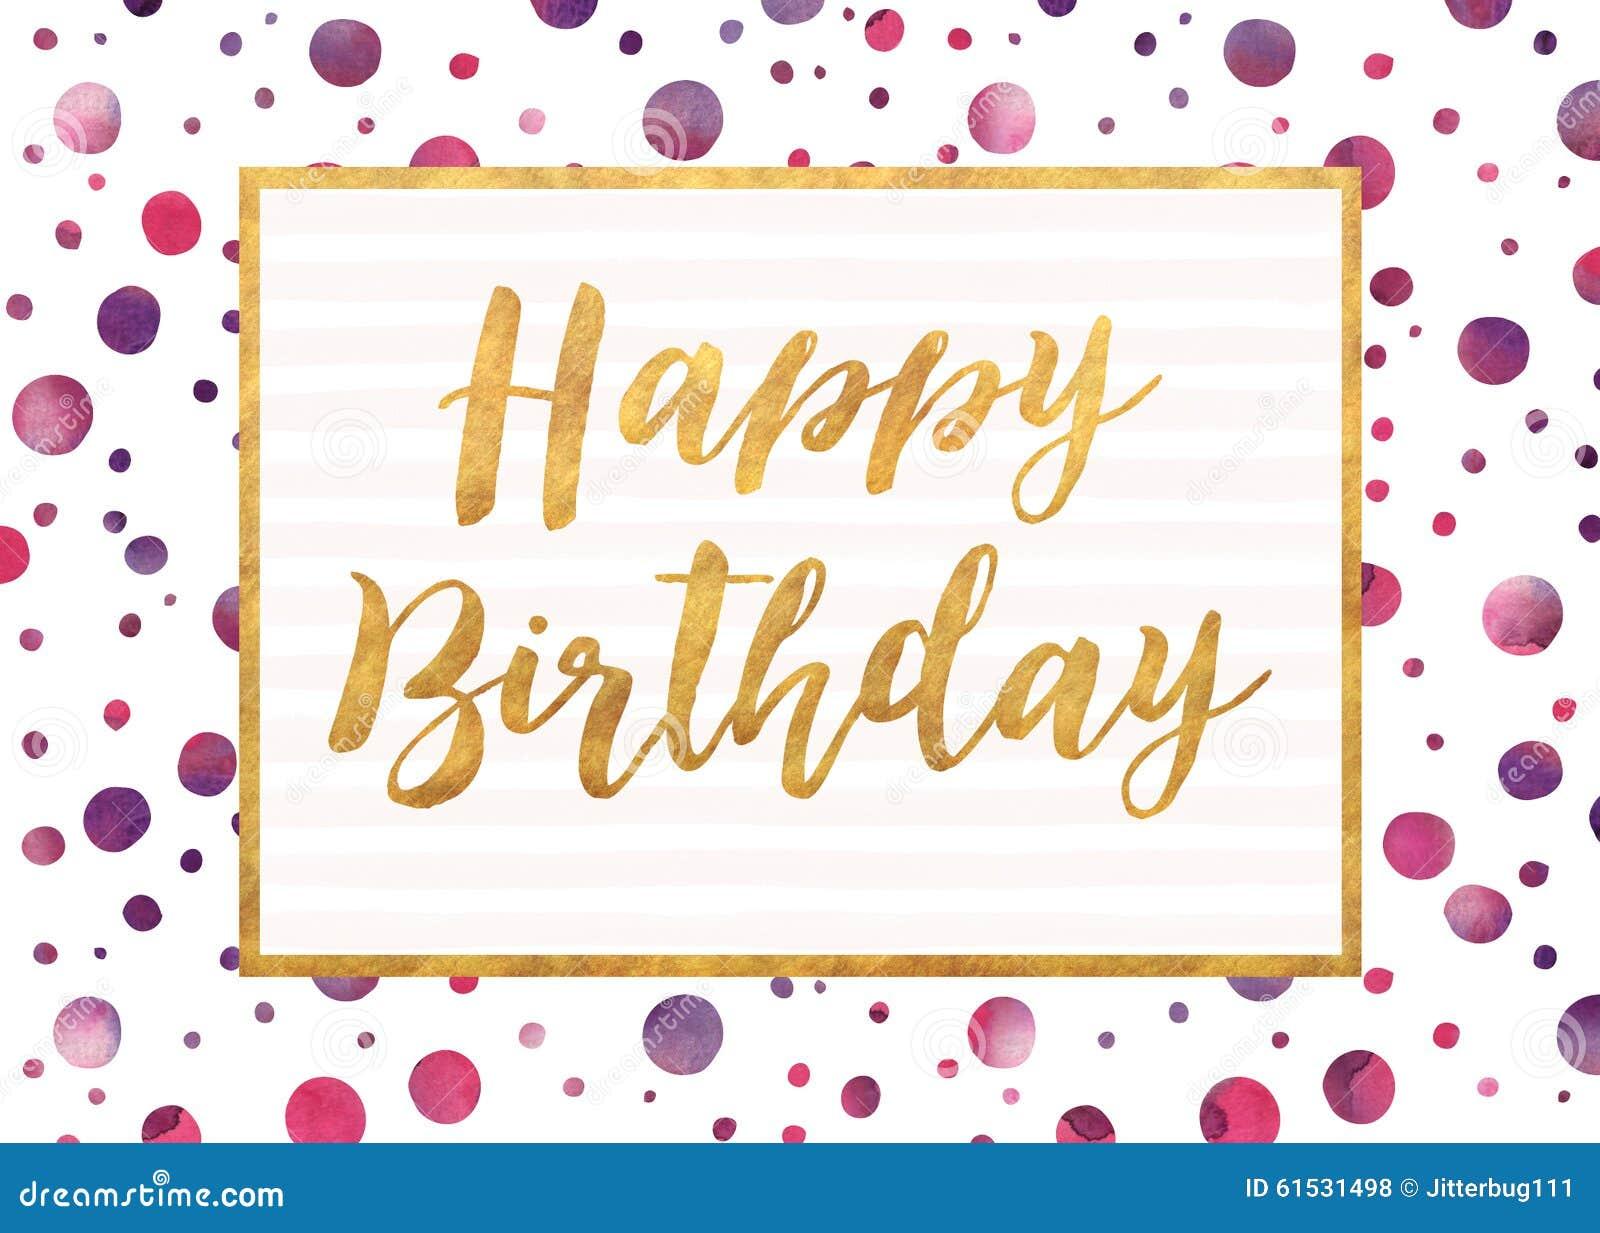 Happy Birthday Stock Photo Image Of Watercolor Dots 61531498